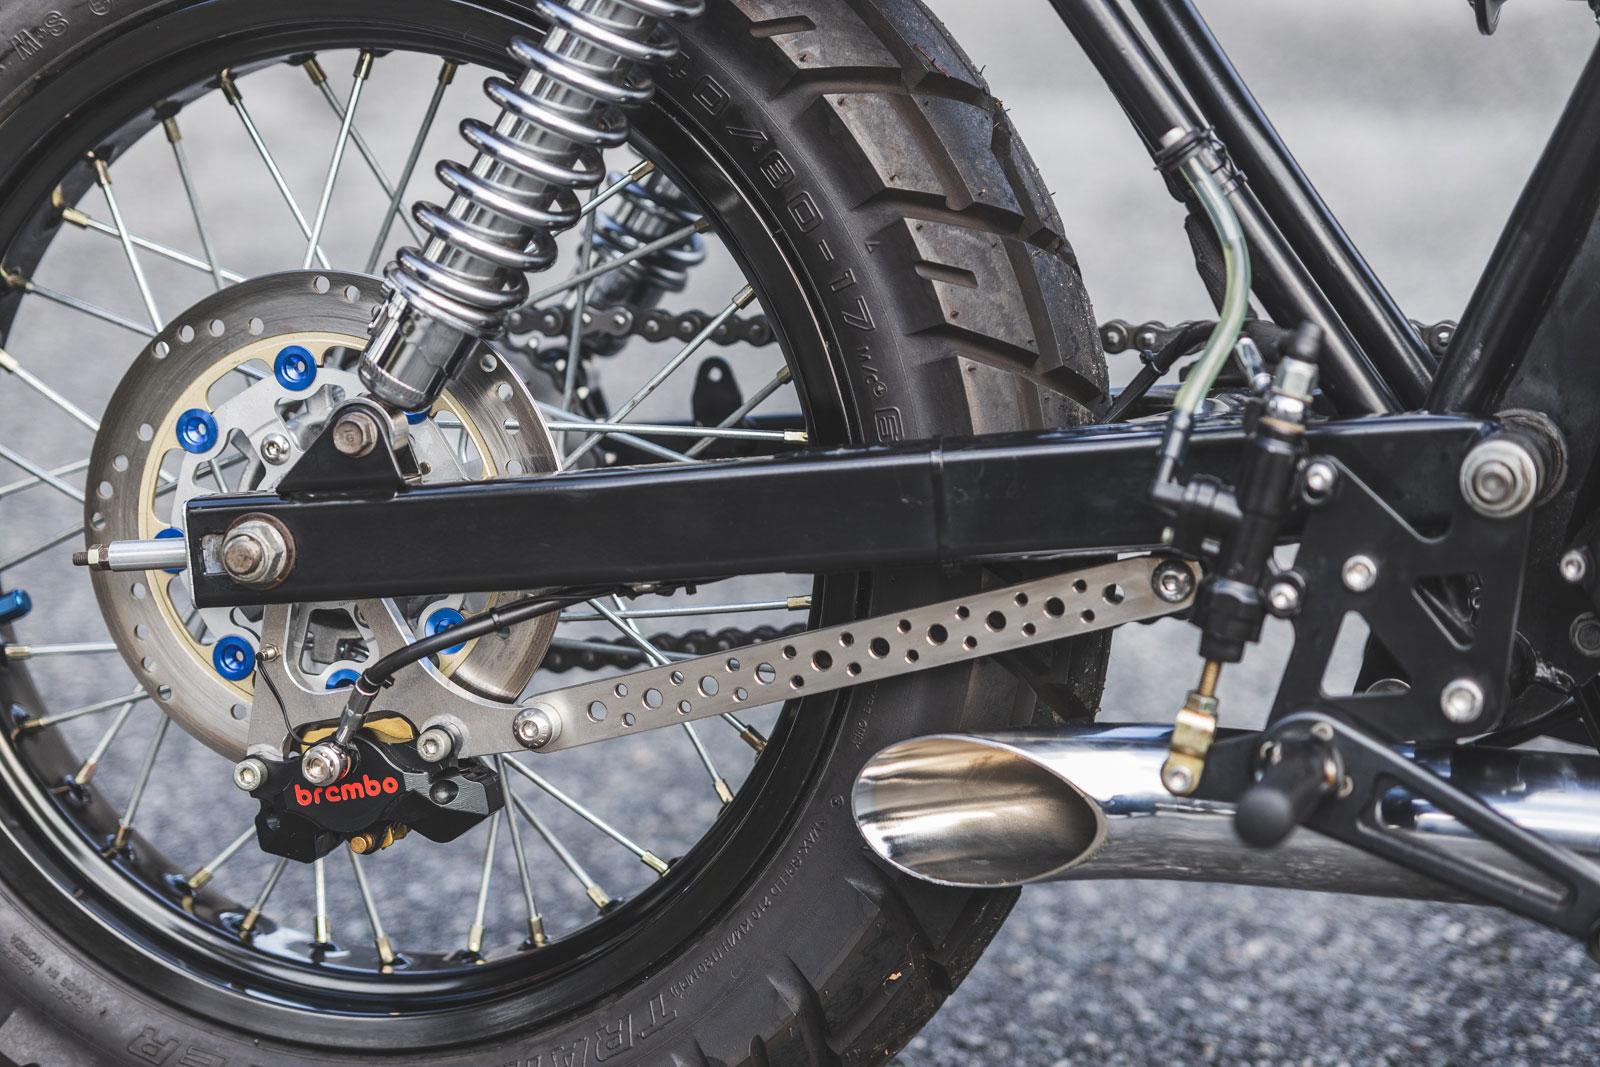 Honda CB250 street scrambler